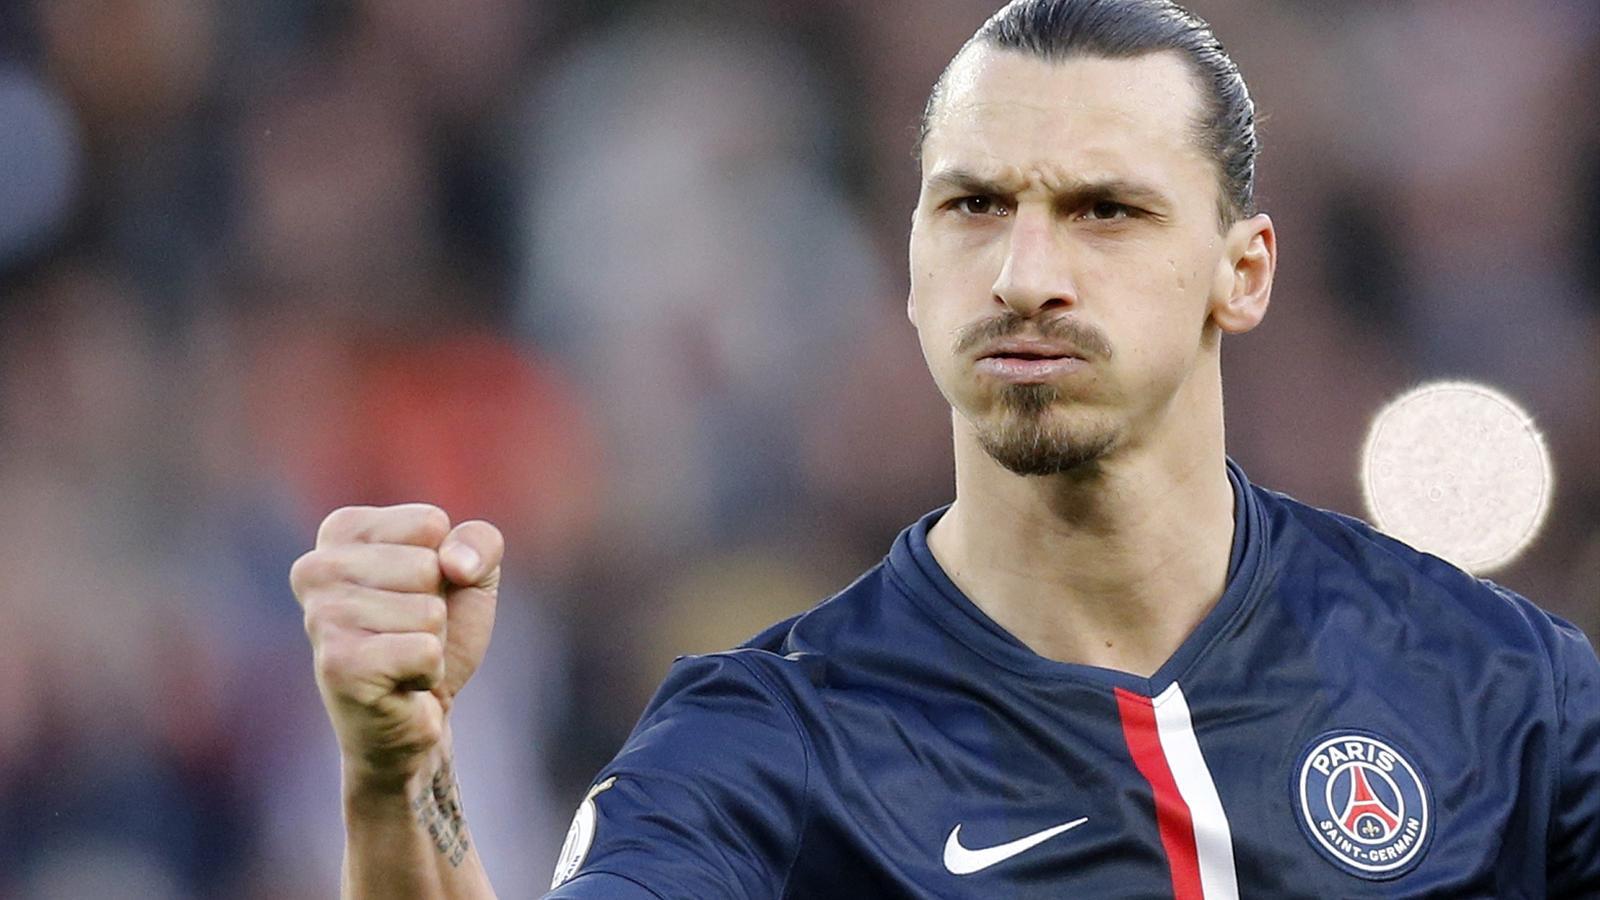 Zlatan Ibrahimovic Player Profile Football Eurosport